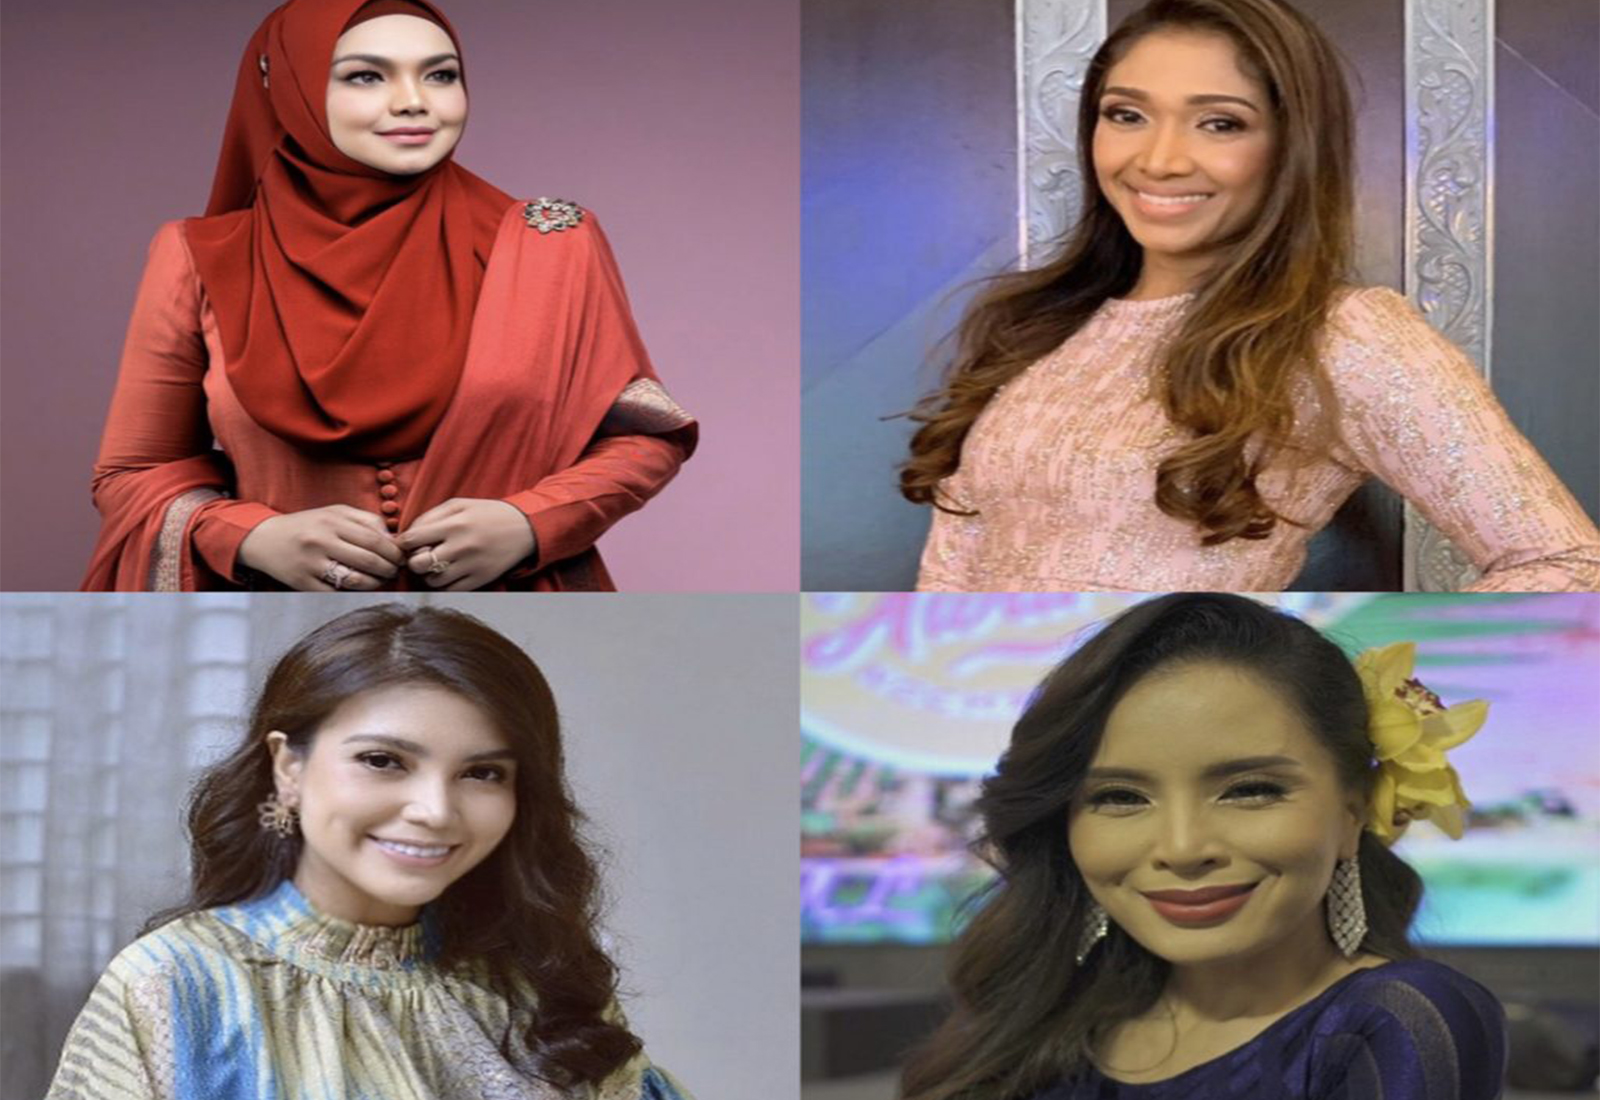 Photo of Selebriti Popular Nyanyi Lagu Gemilang, Rayu Rakyat Duduk Rumah